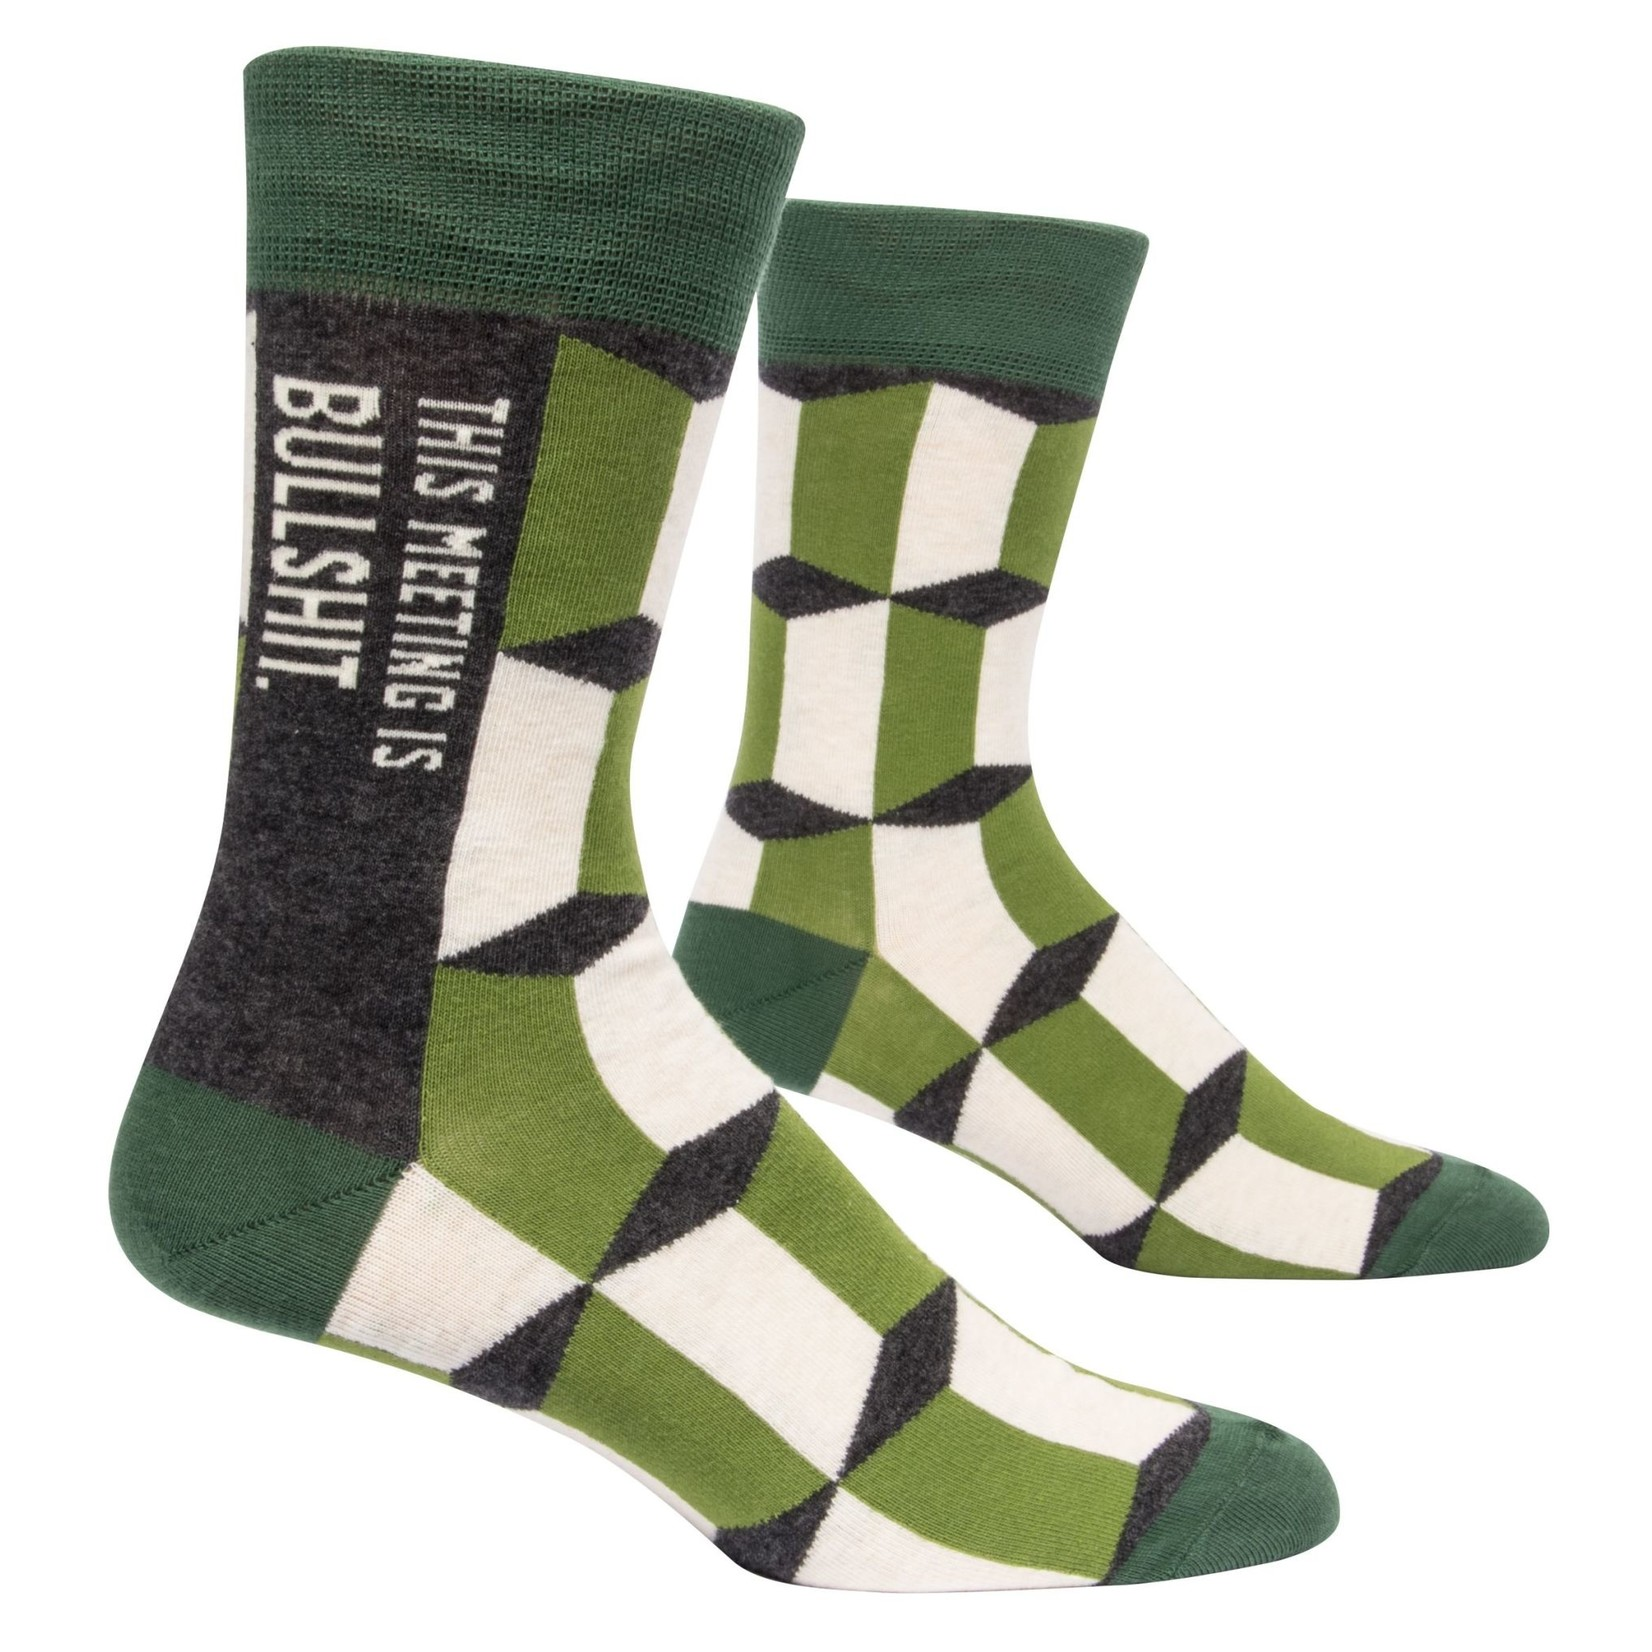 Blue Q Best Sellers - Mens Socks